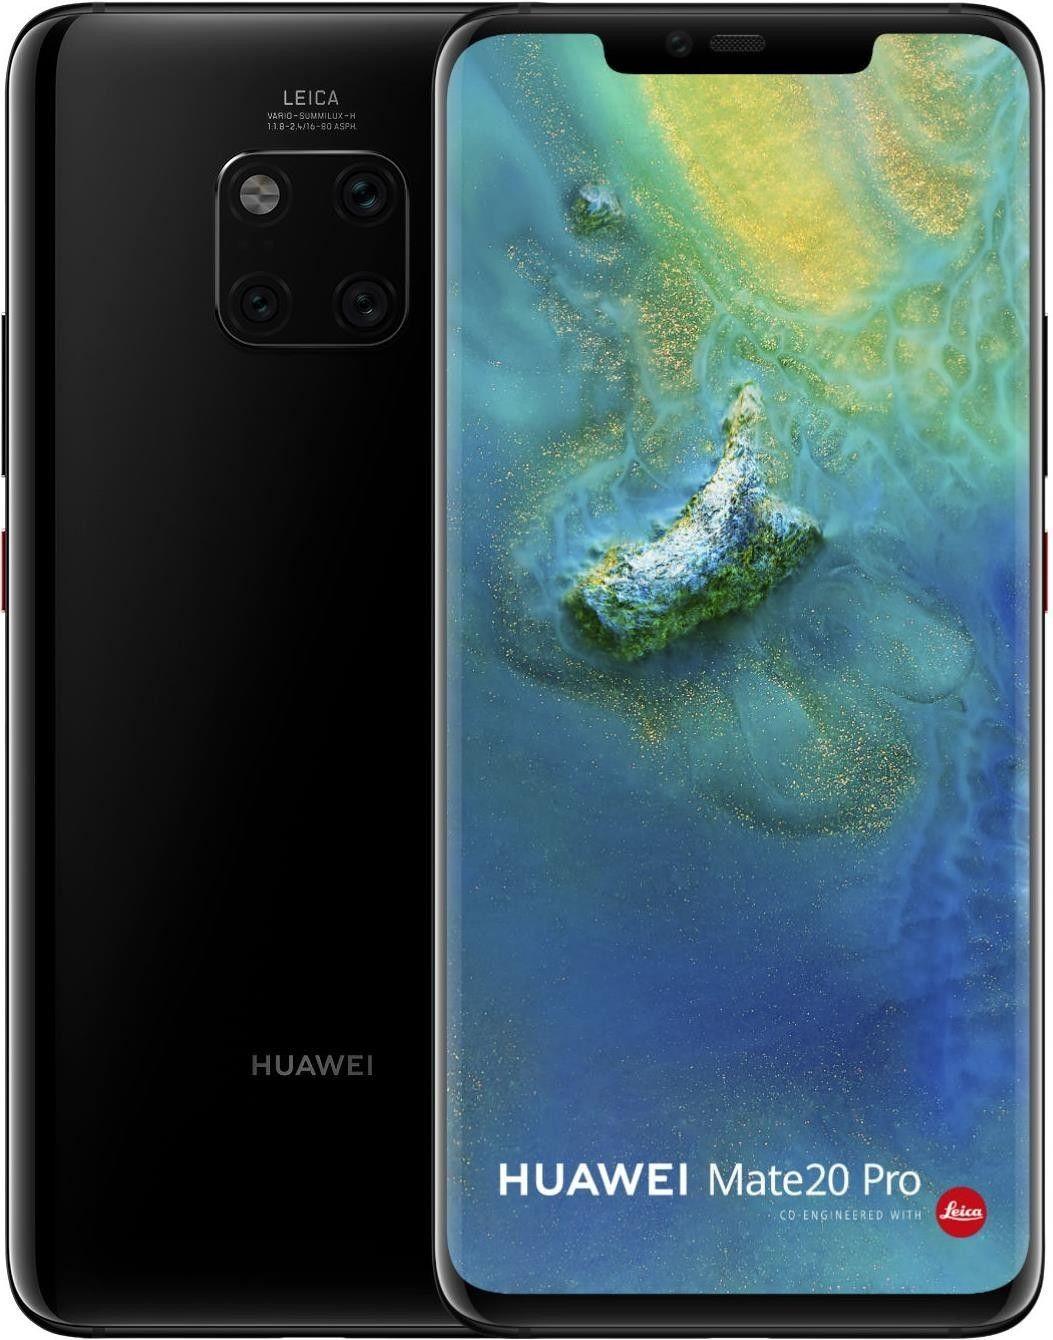 Huawei Mate 20 Pro im SuperSelect (O2, 3GB LTE, Allnet/ SMS) mtl. 14,99€ und einmalig 89€